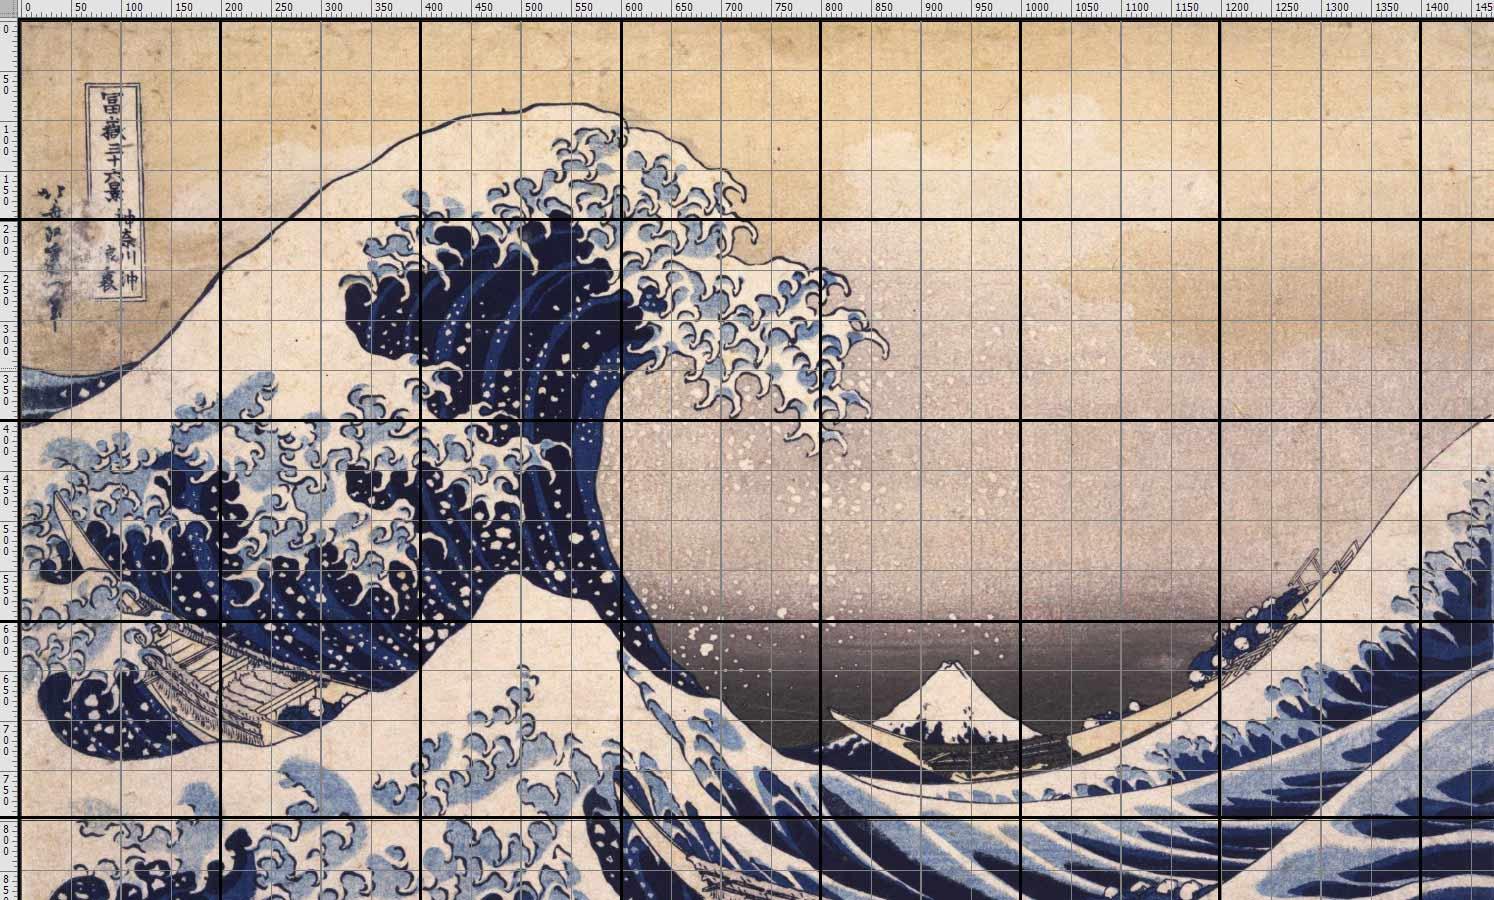 Dibujar La gran ola de Hokusai